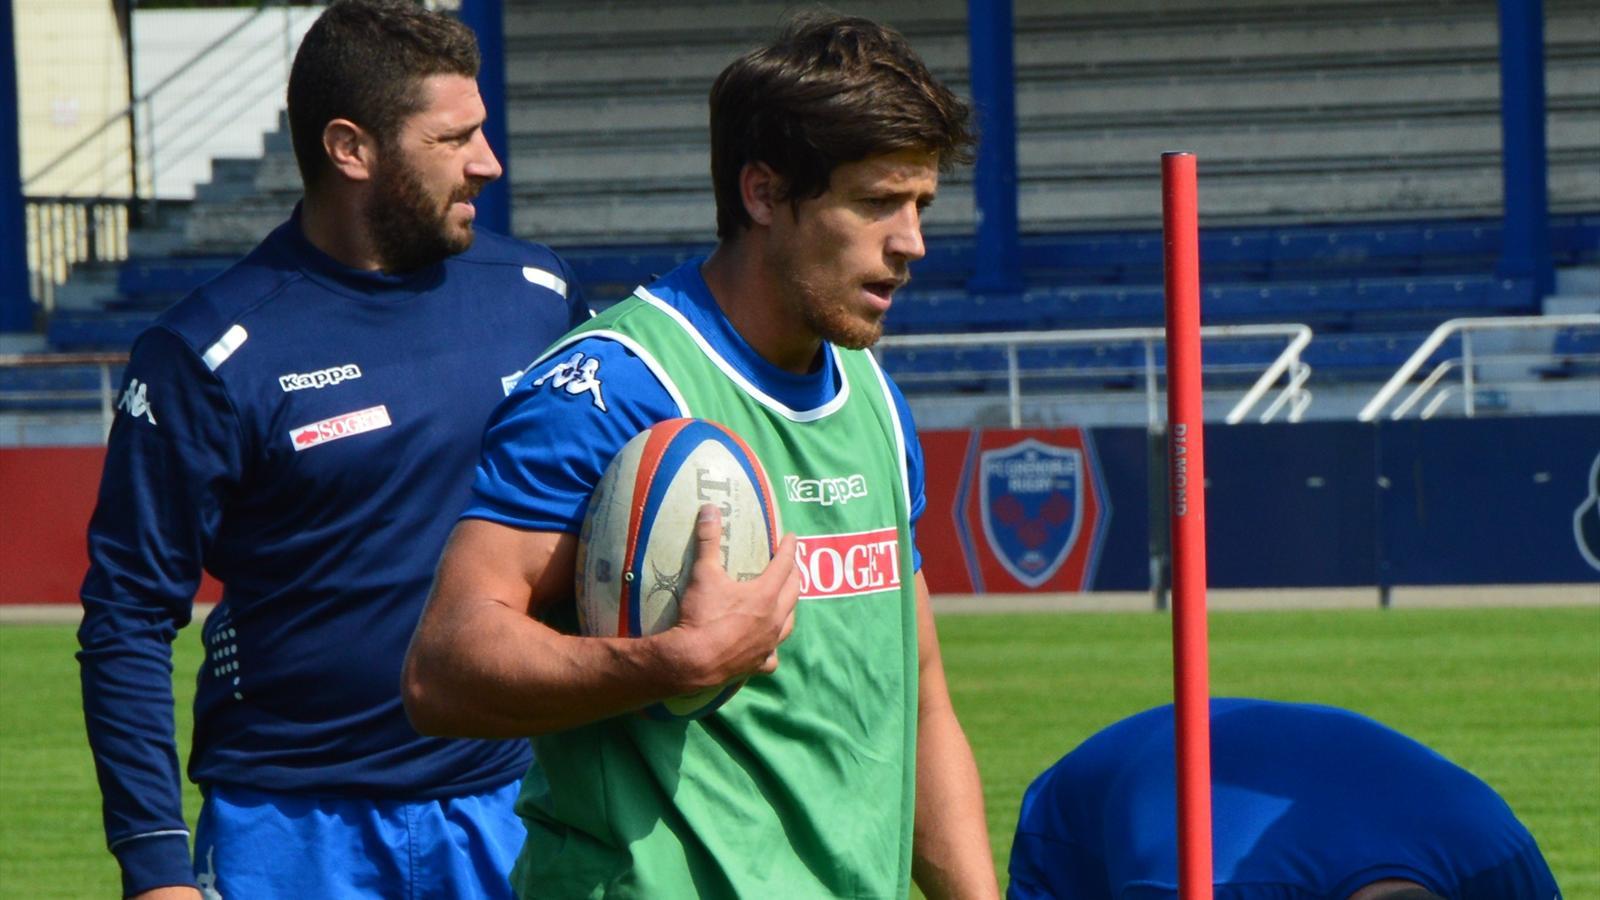 Armand Batlle (Grenoble) - Photo Laurent Genin - Juillet 2015